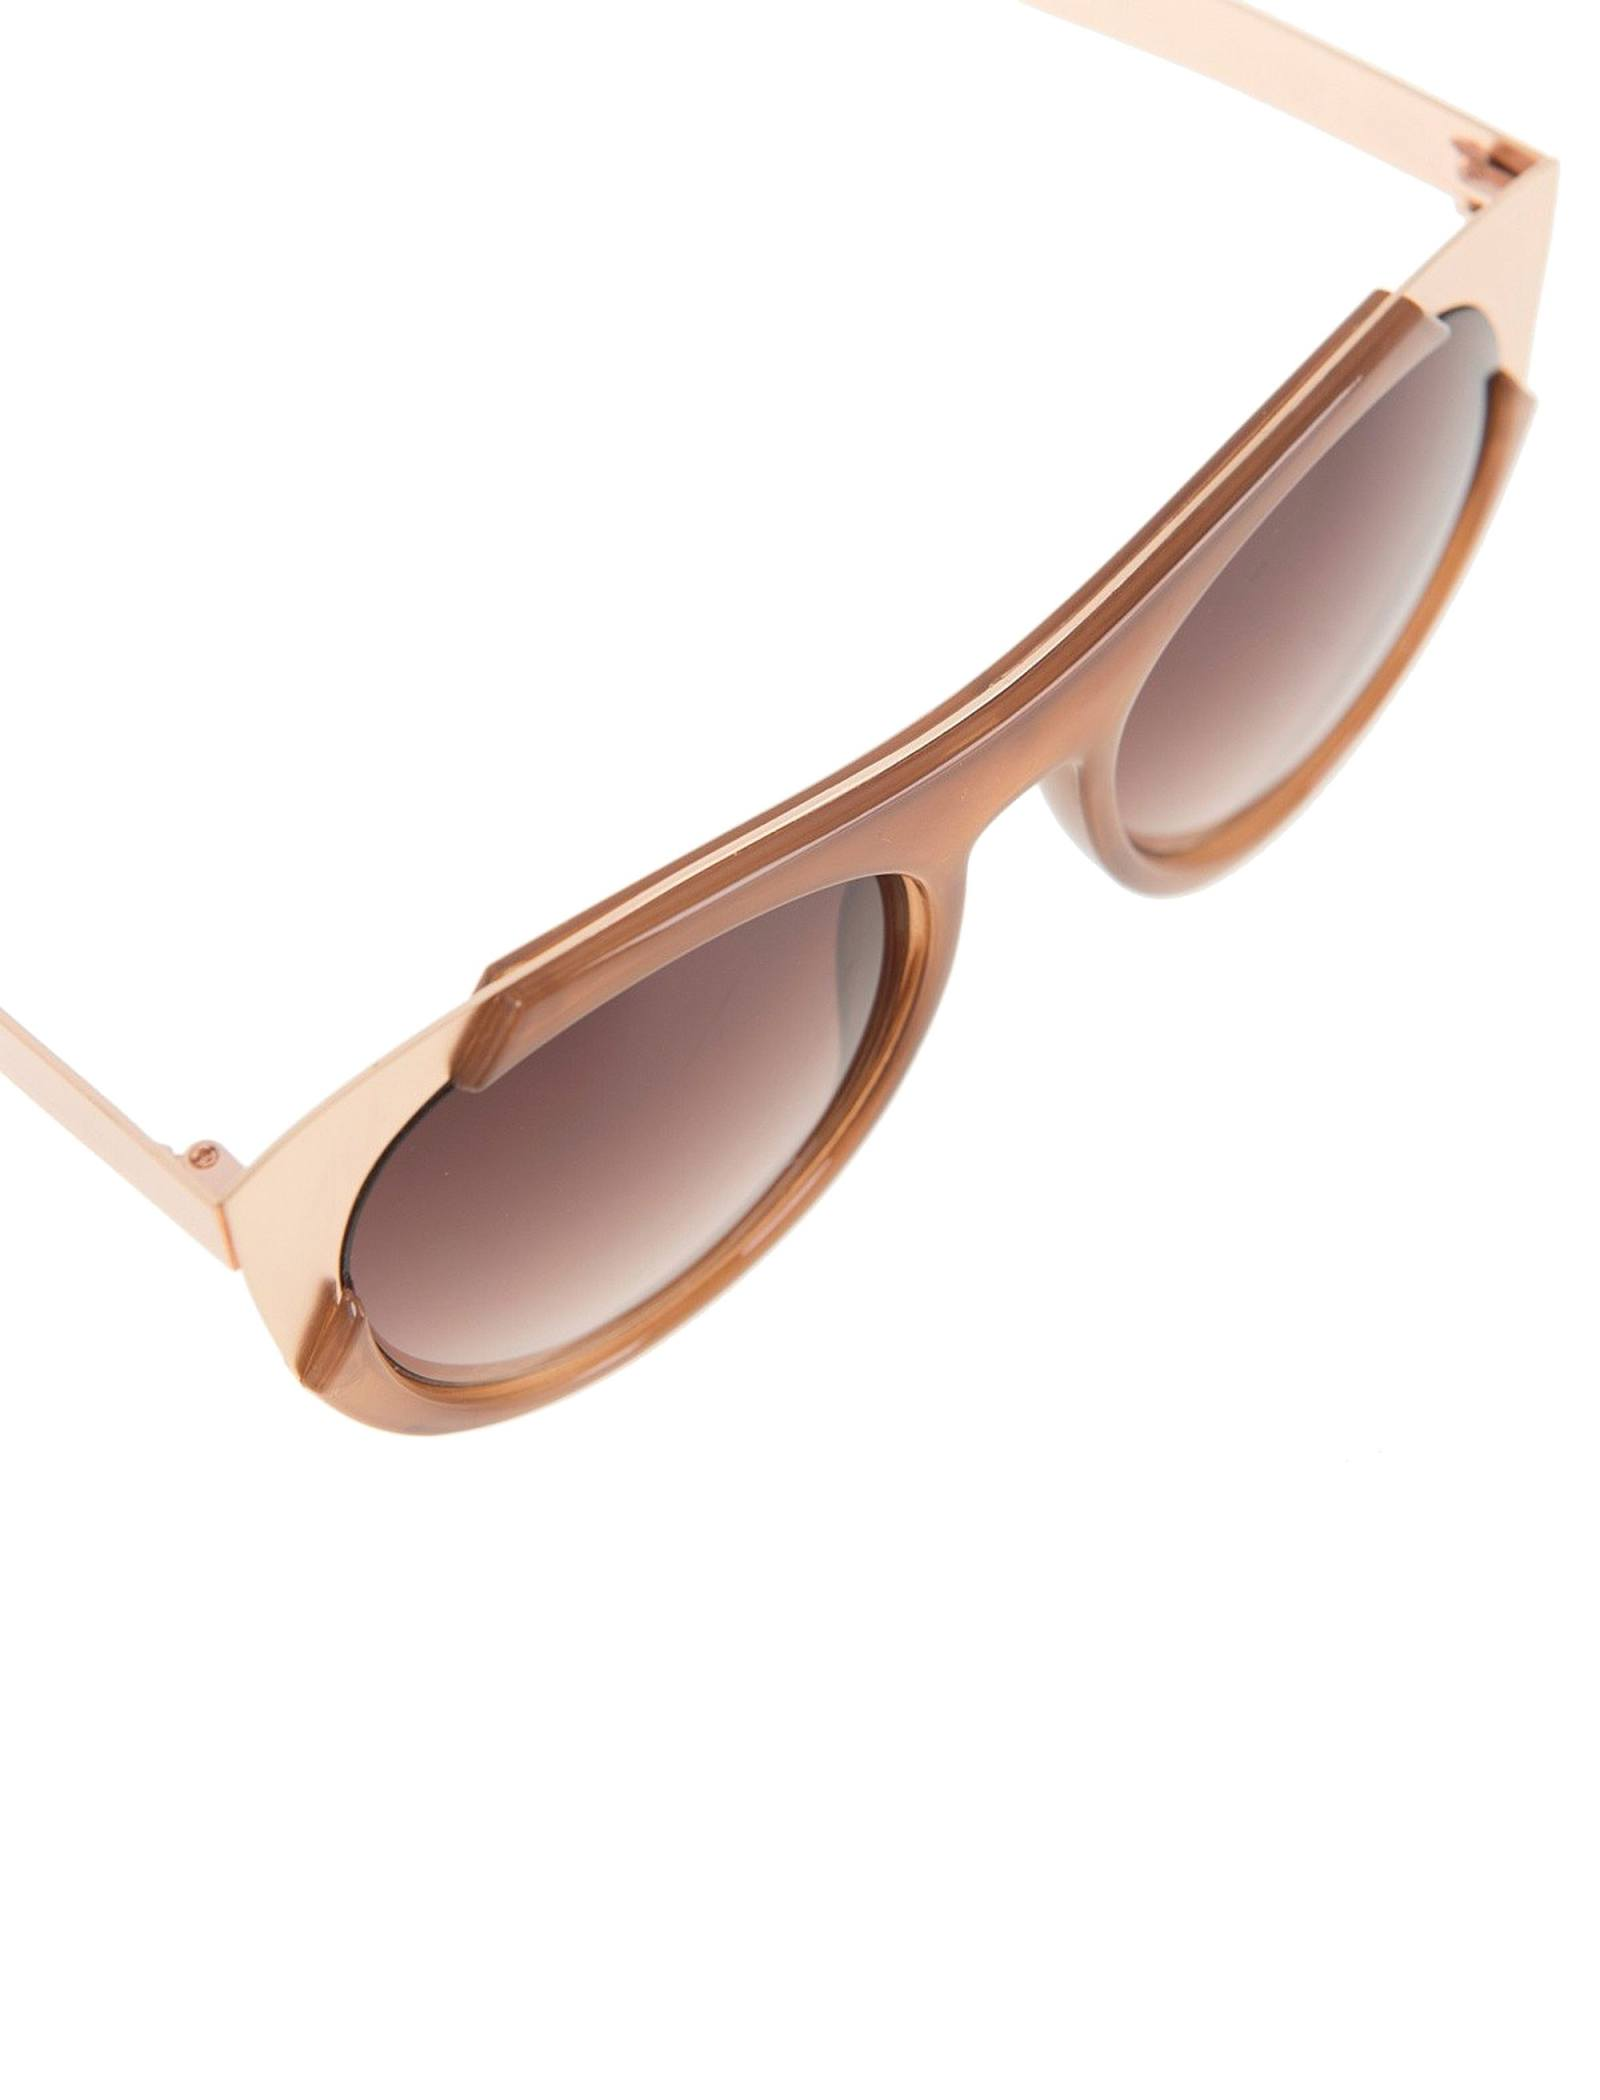 عینک آفتابی زنانه - پارفوا - صورتي - 3